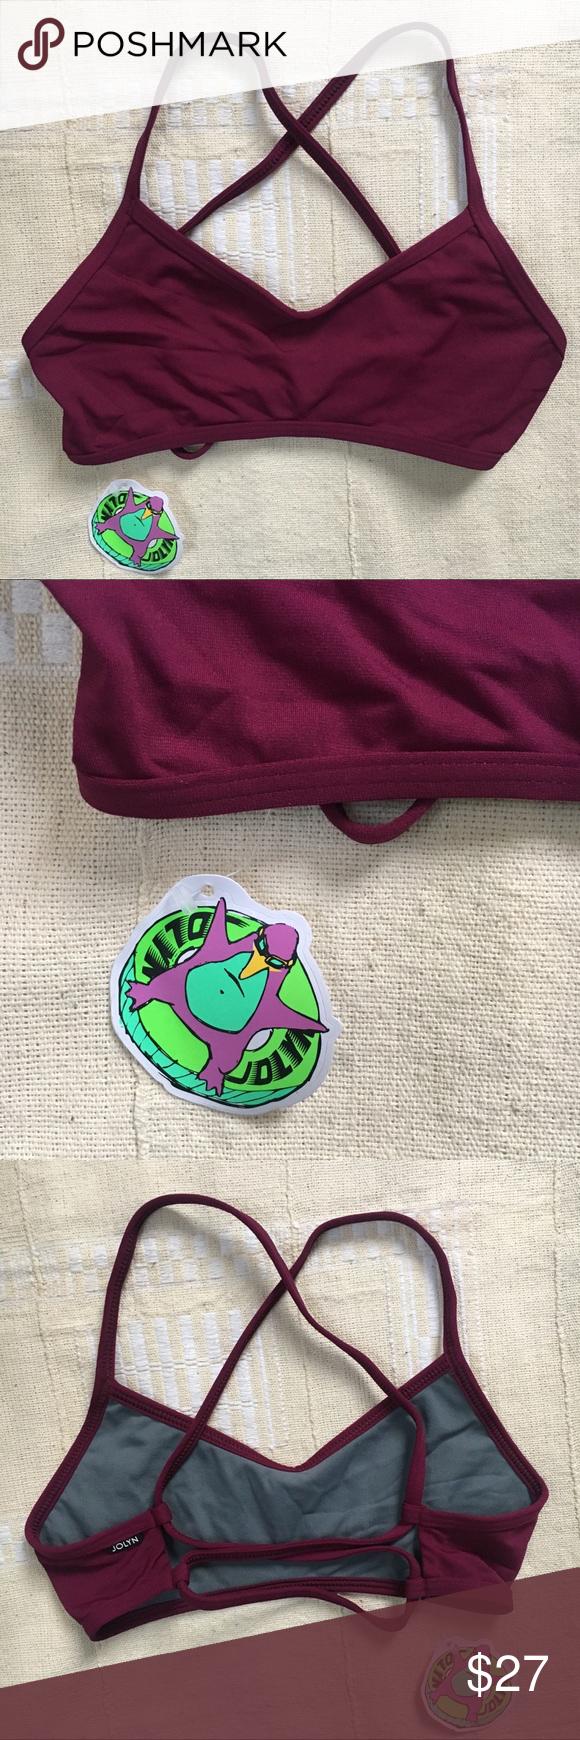 Nwt jolyn xavier fixed back bikini top cabernet xs brand new with tags grayson also my posh rh pinterest